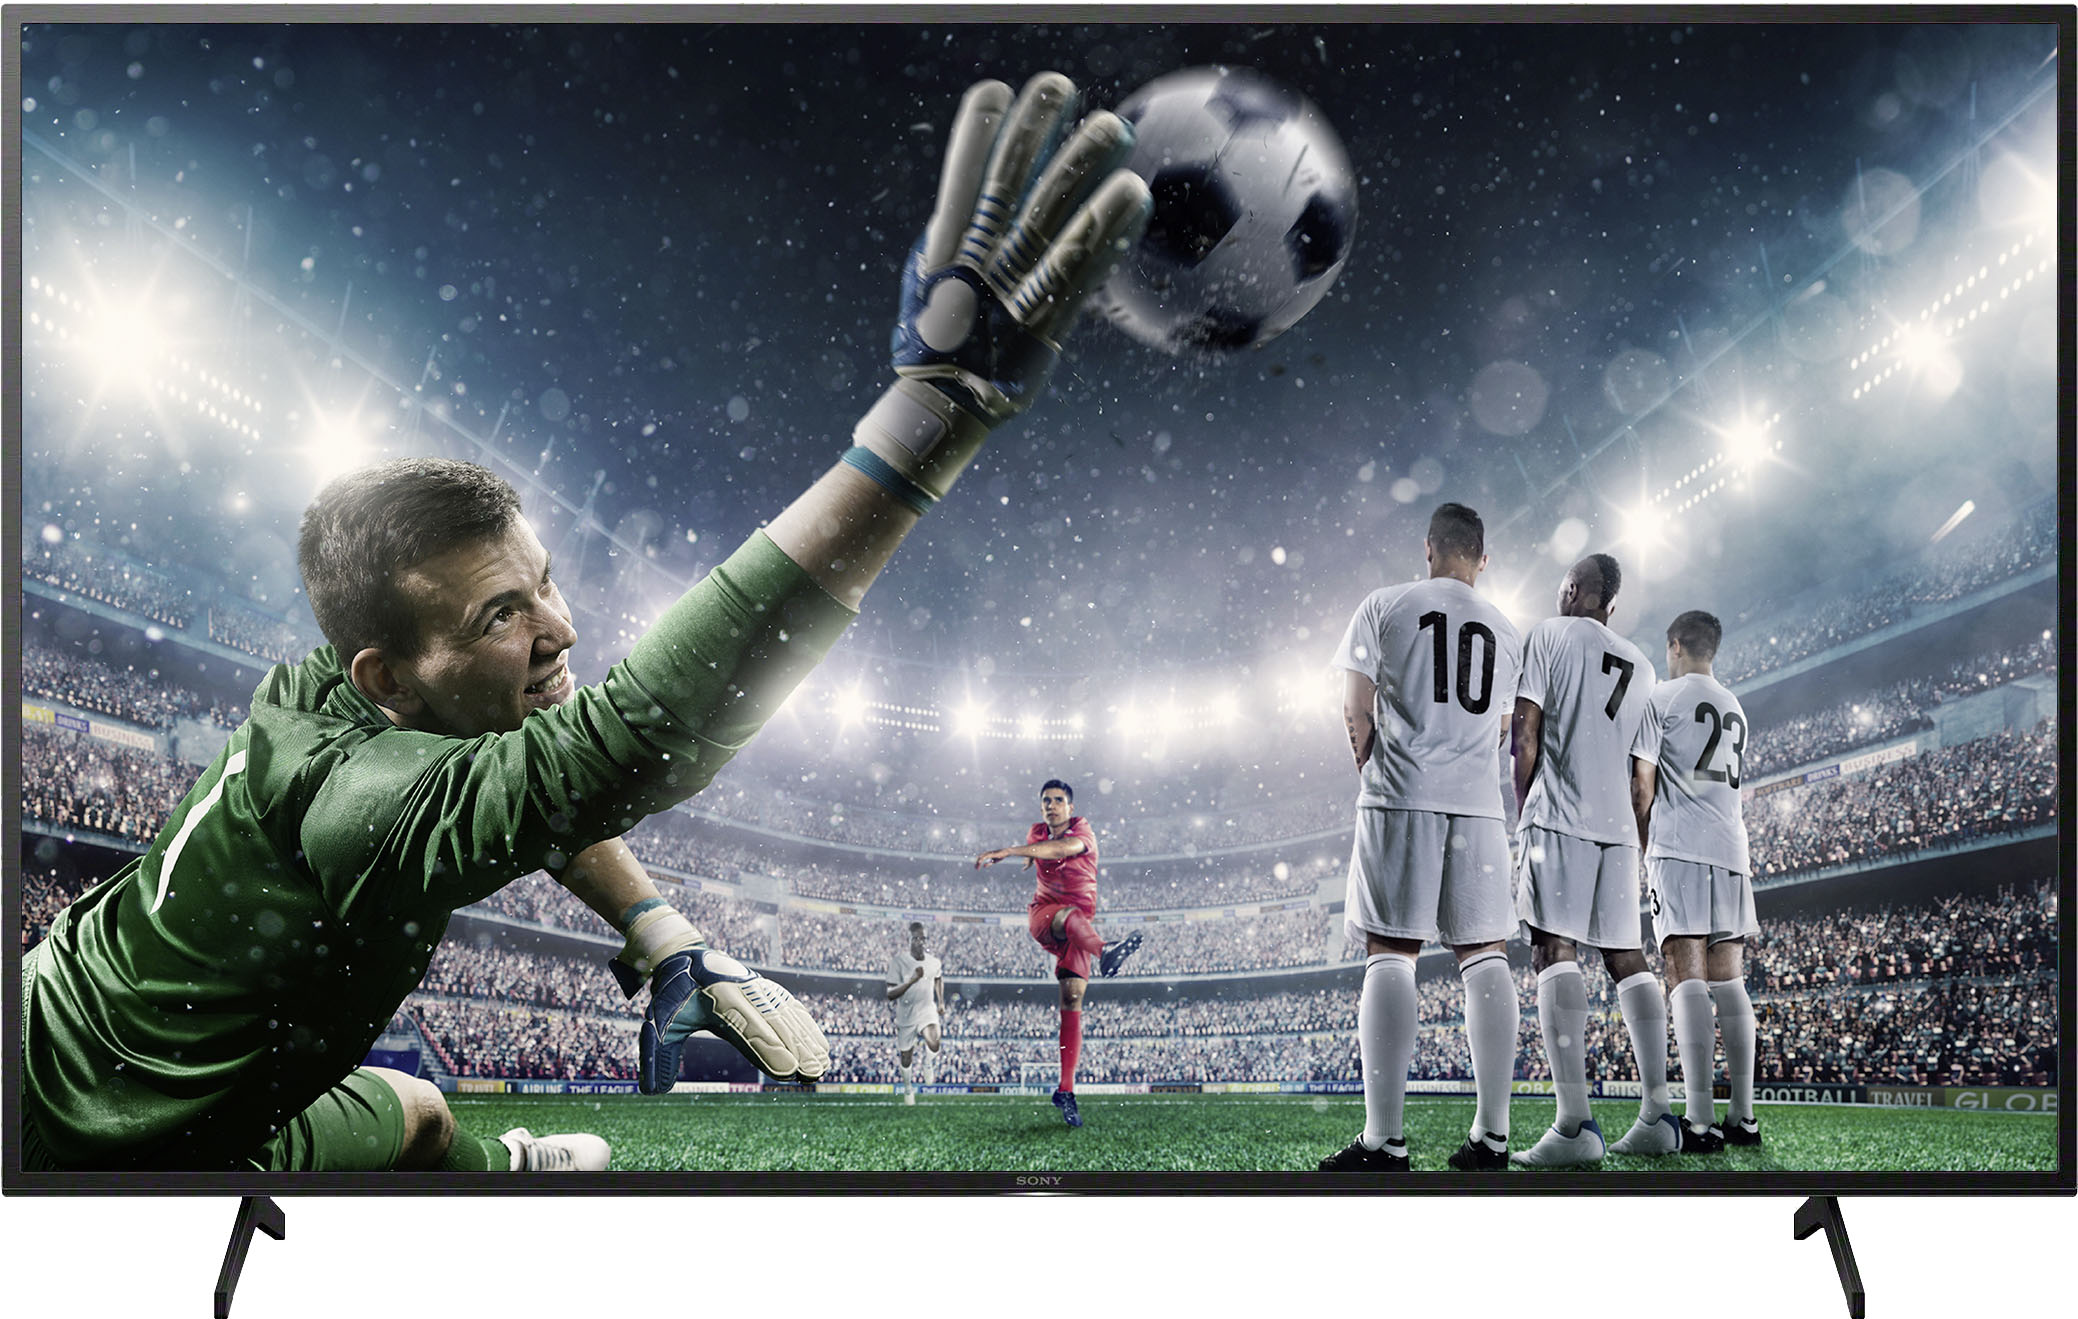 Sony LED-Fernseher KE-65XH8096 , 164 cm 65 , 4K Ultra HD, Android TV-Smart-TV